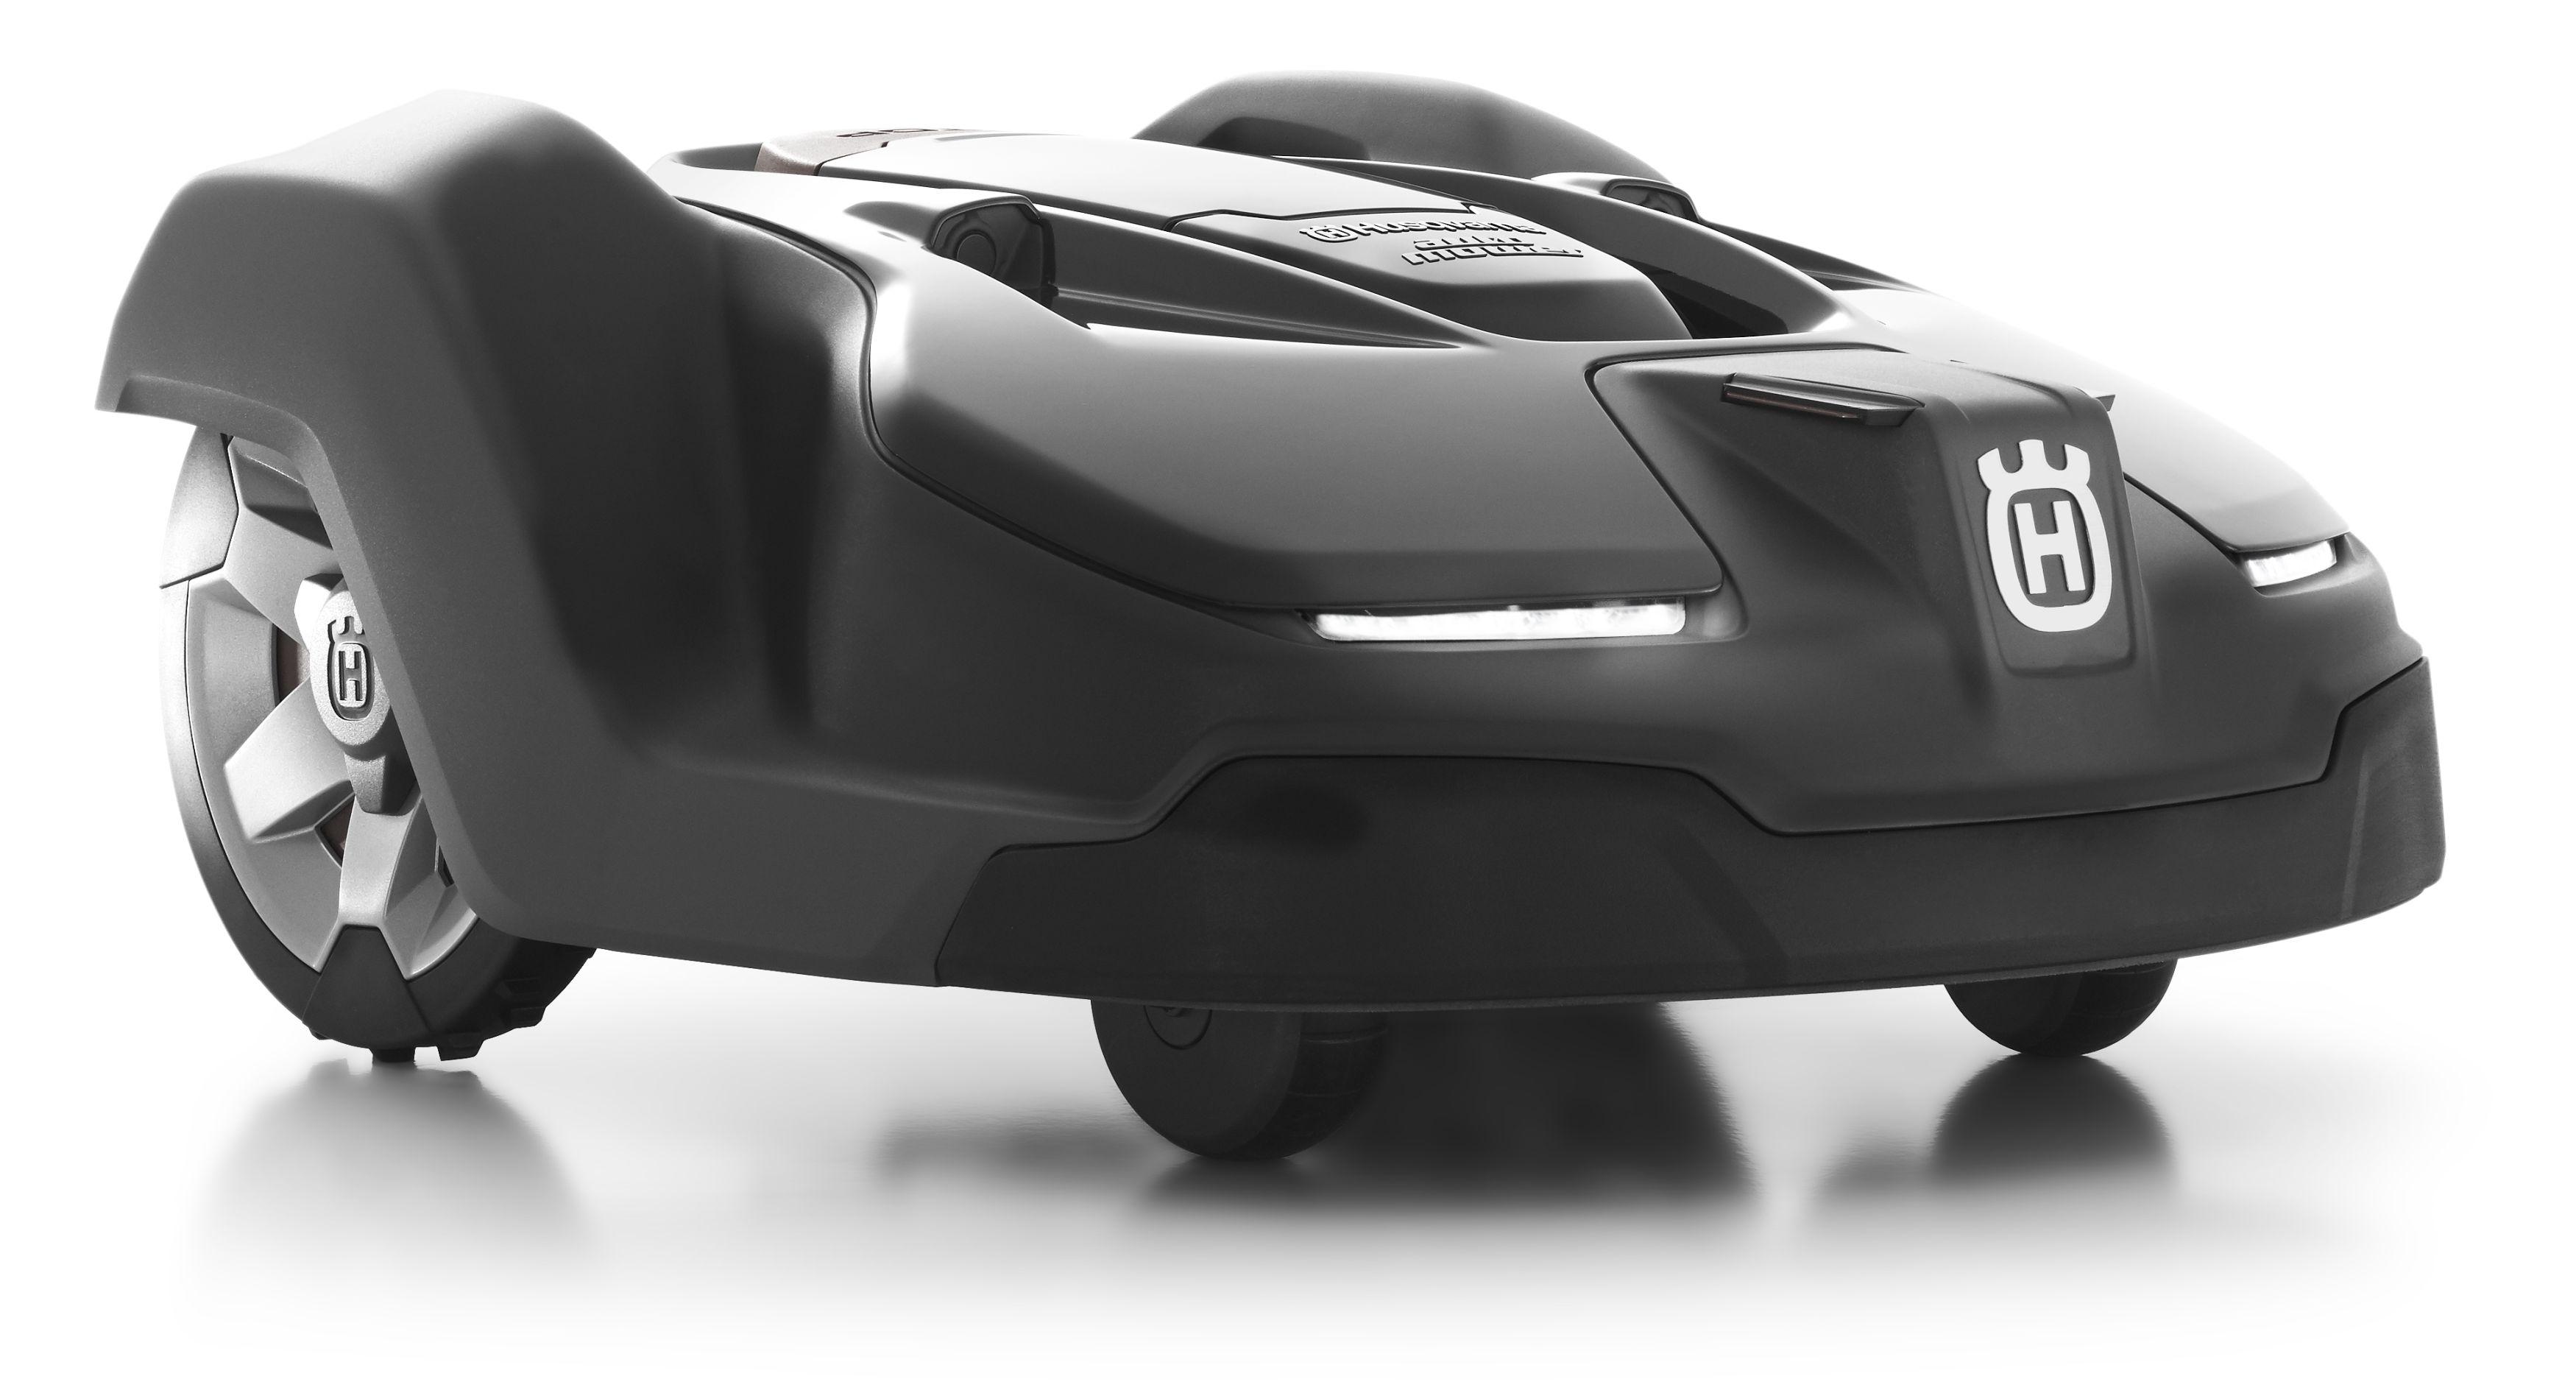 automower 450 x. Black Bedroom Furniture Sets. Home Design Ideas